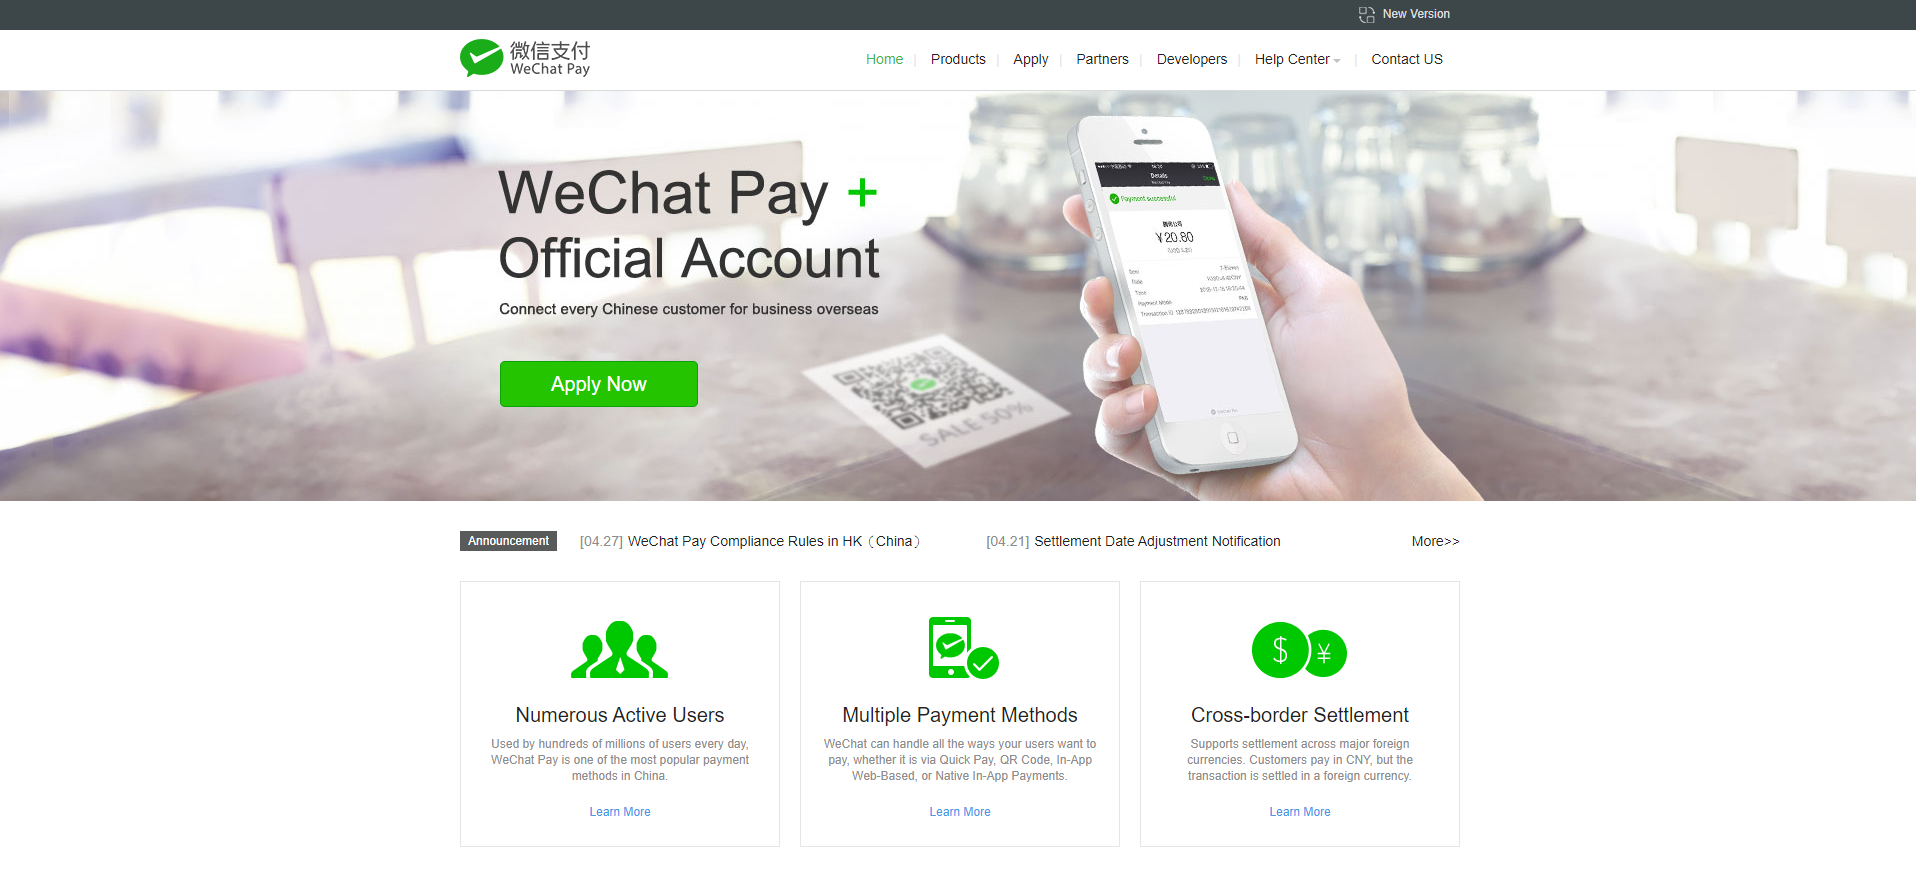 PayMe 跟 WeChat Pay 用法相似